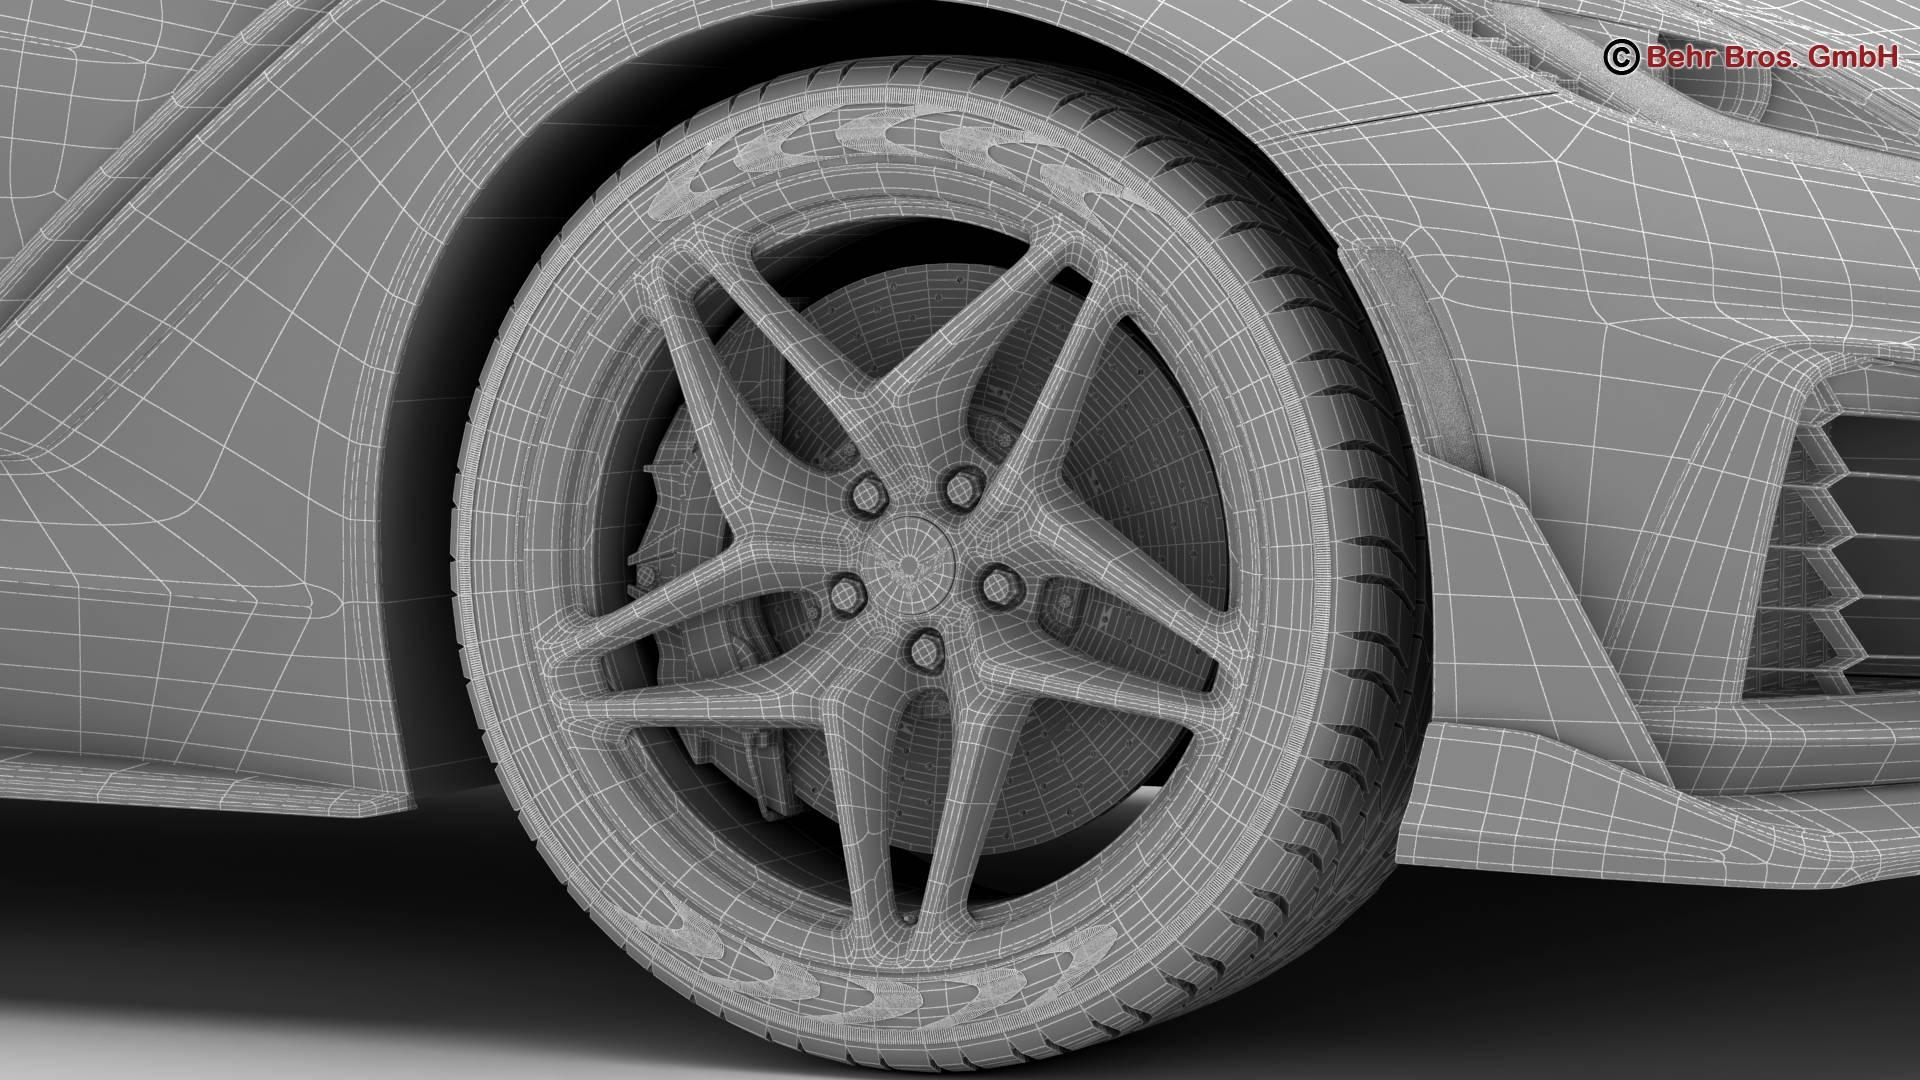 chevrolet corvette zr1 2019 3d model 3ds max fbx c4d lwo ma mb obj 275989